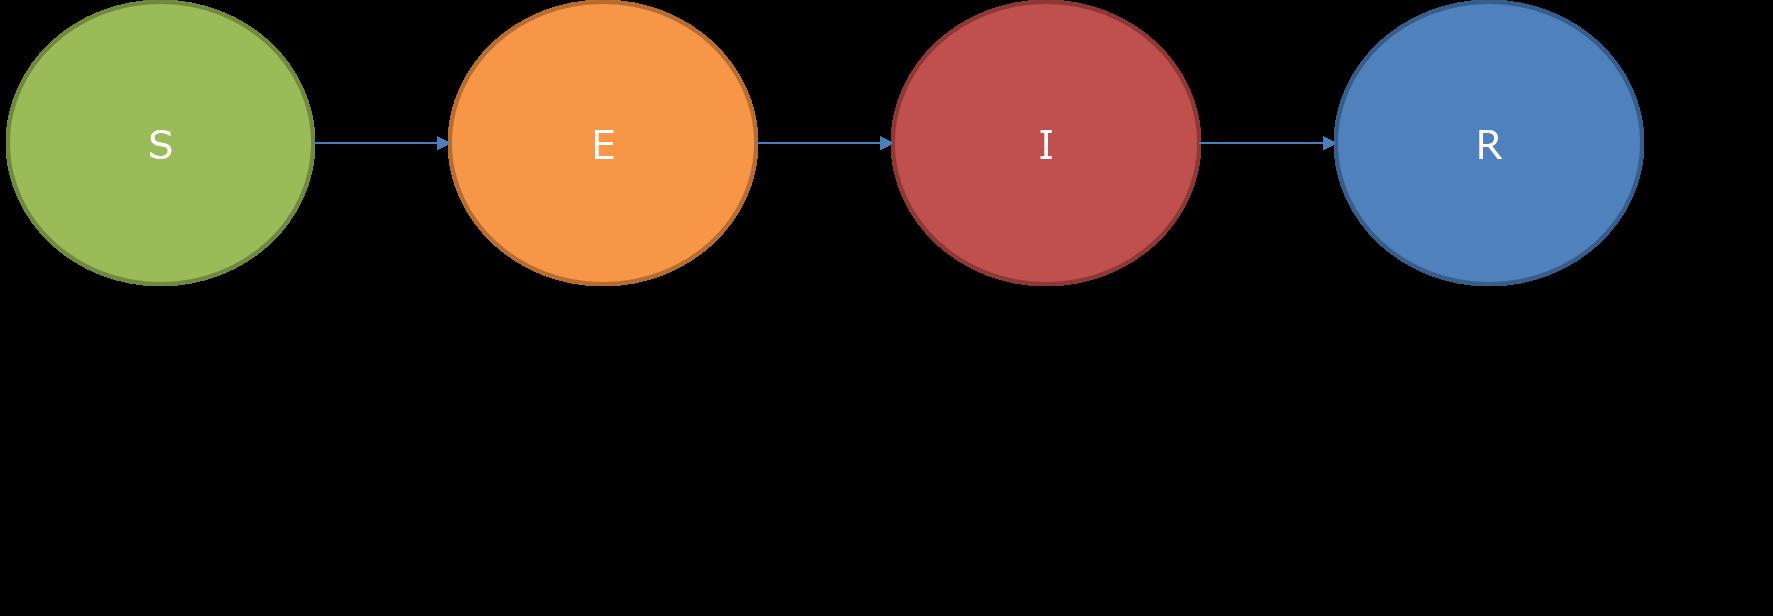 SEIR-model.png